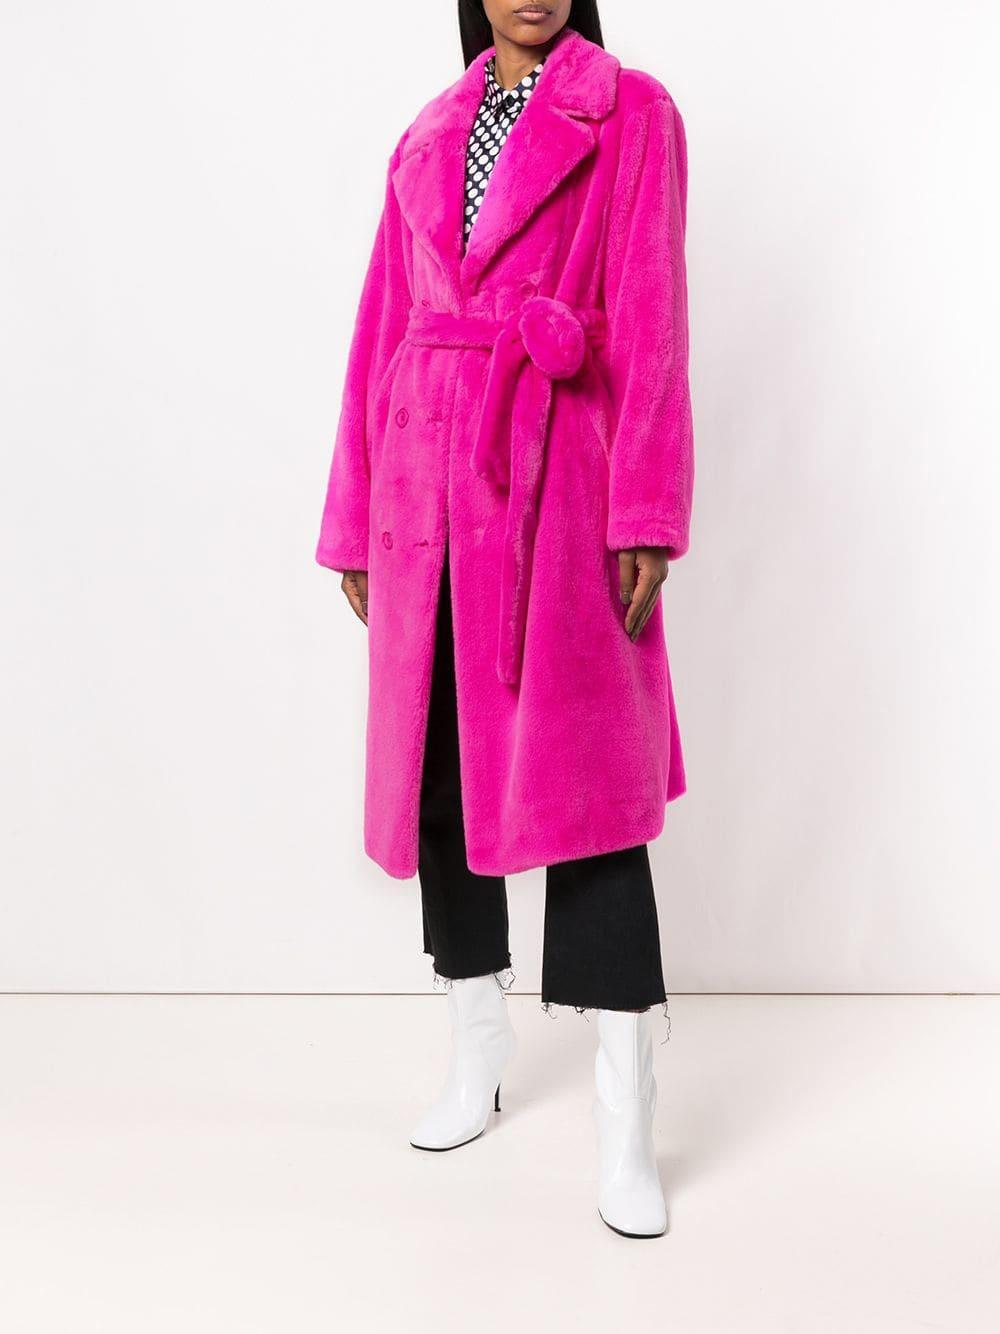 Long Women Coat Sexy Night Club Celebrity Fashion Party Faux Fur Coat Winter Warm Women Outwear